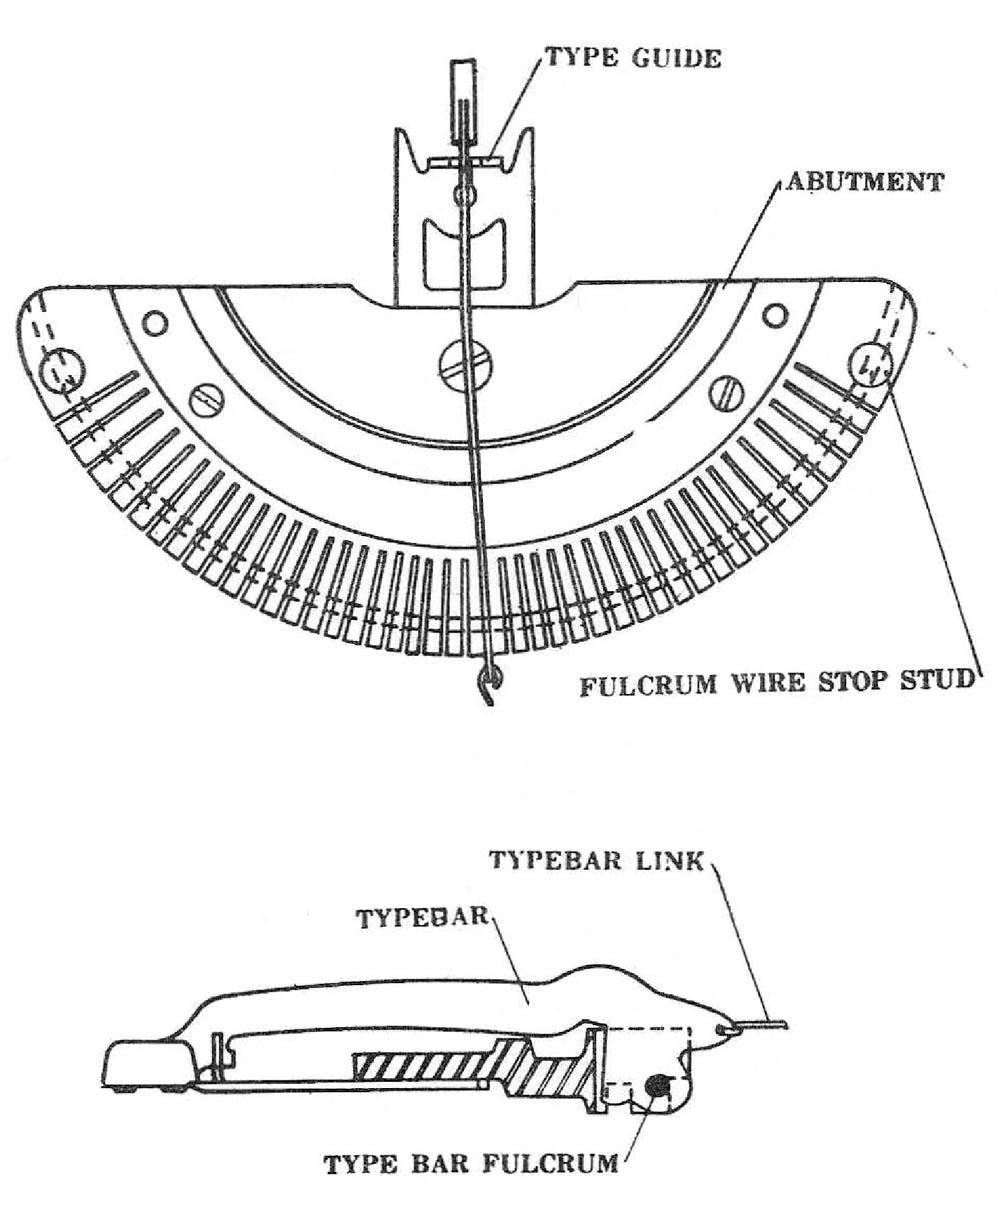 Volume Two: Underwood Portable Typewriters AMES OAMI